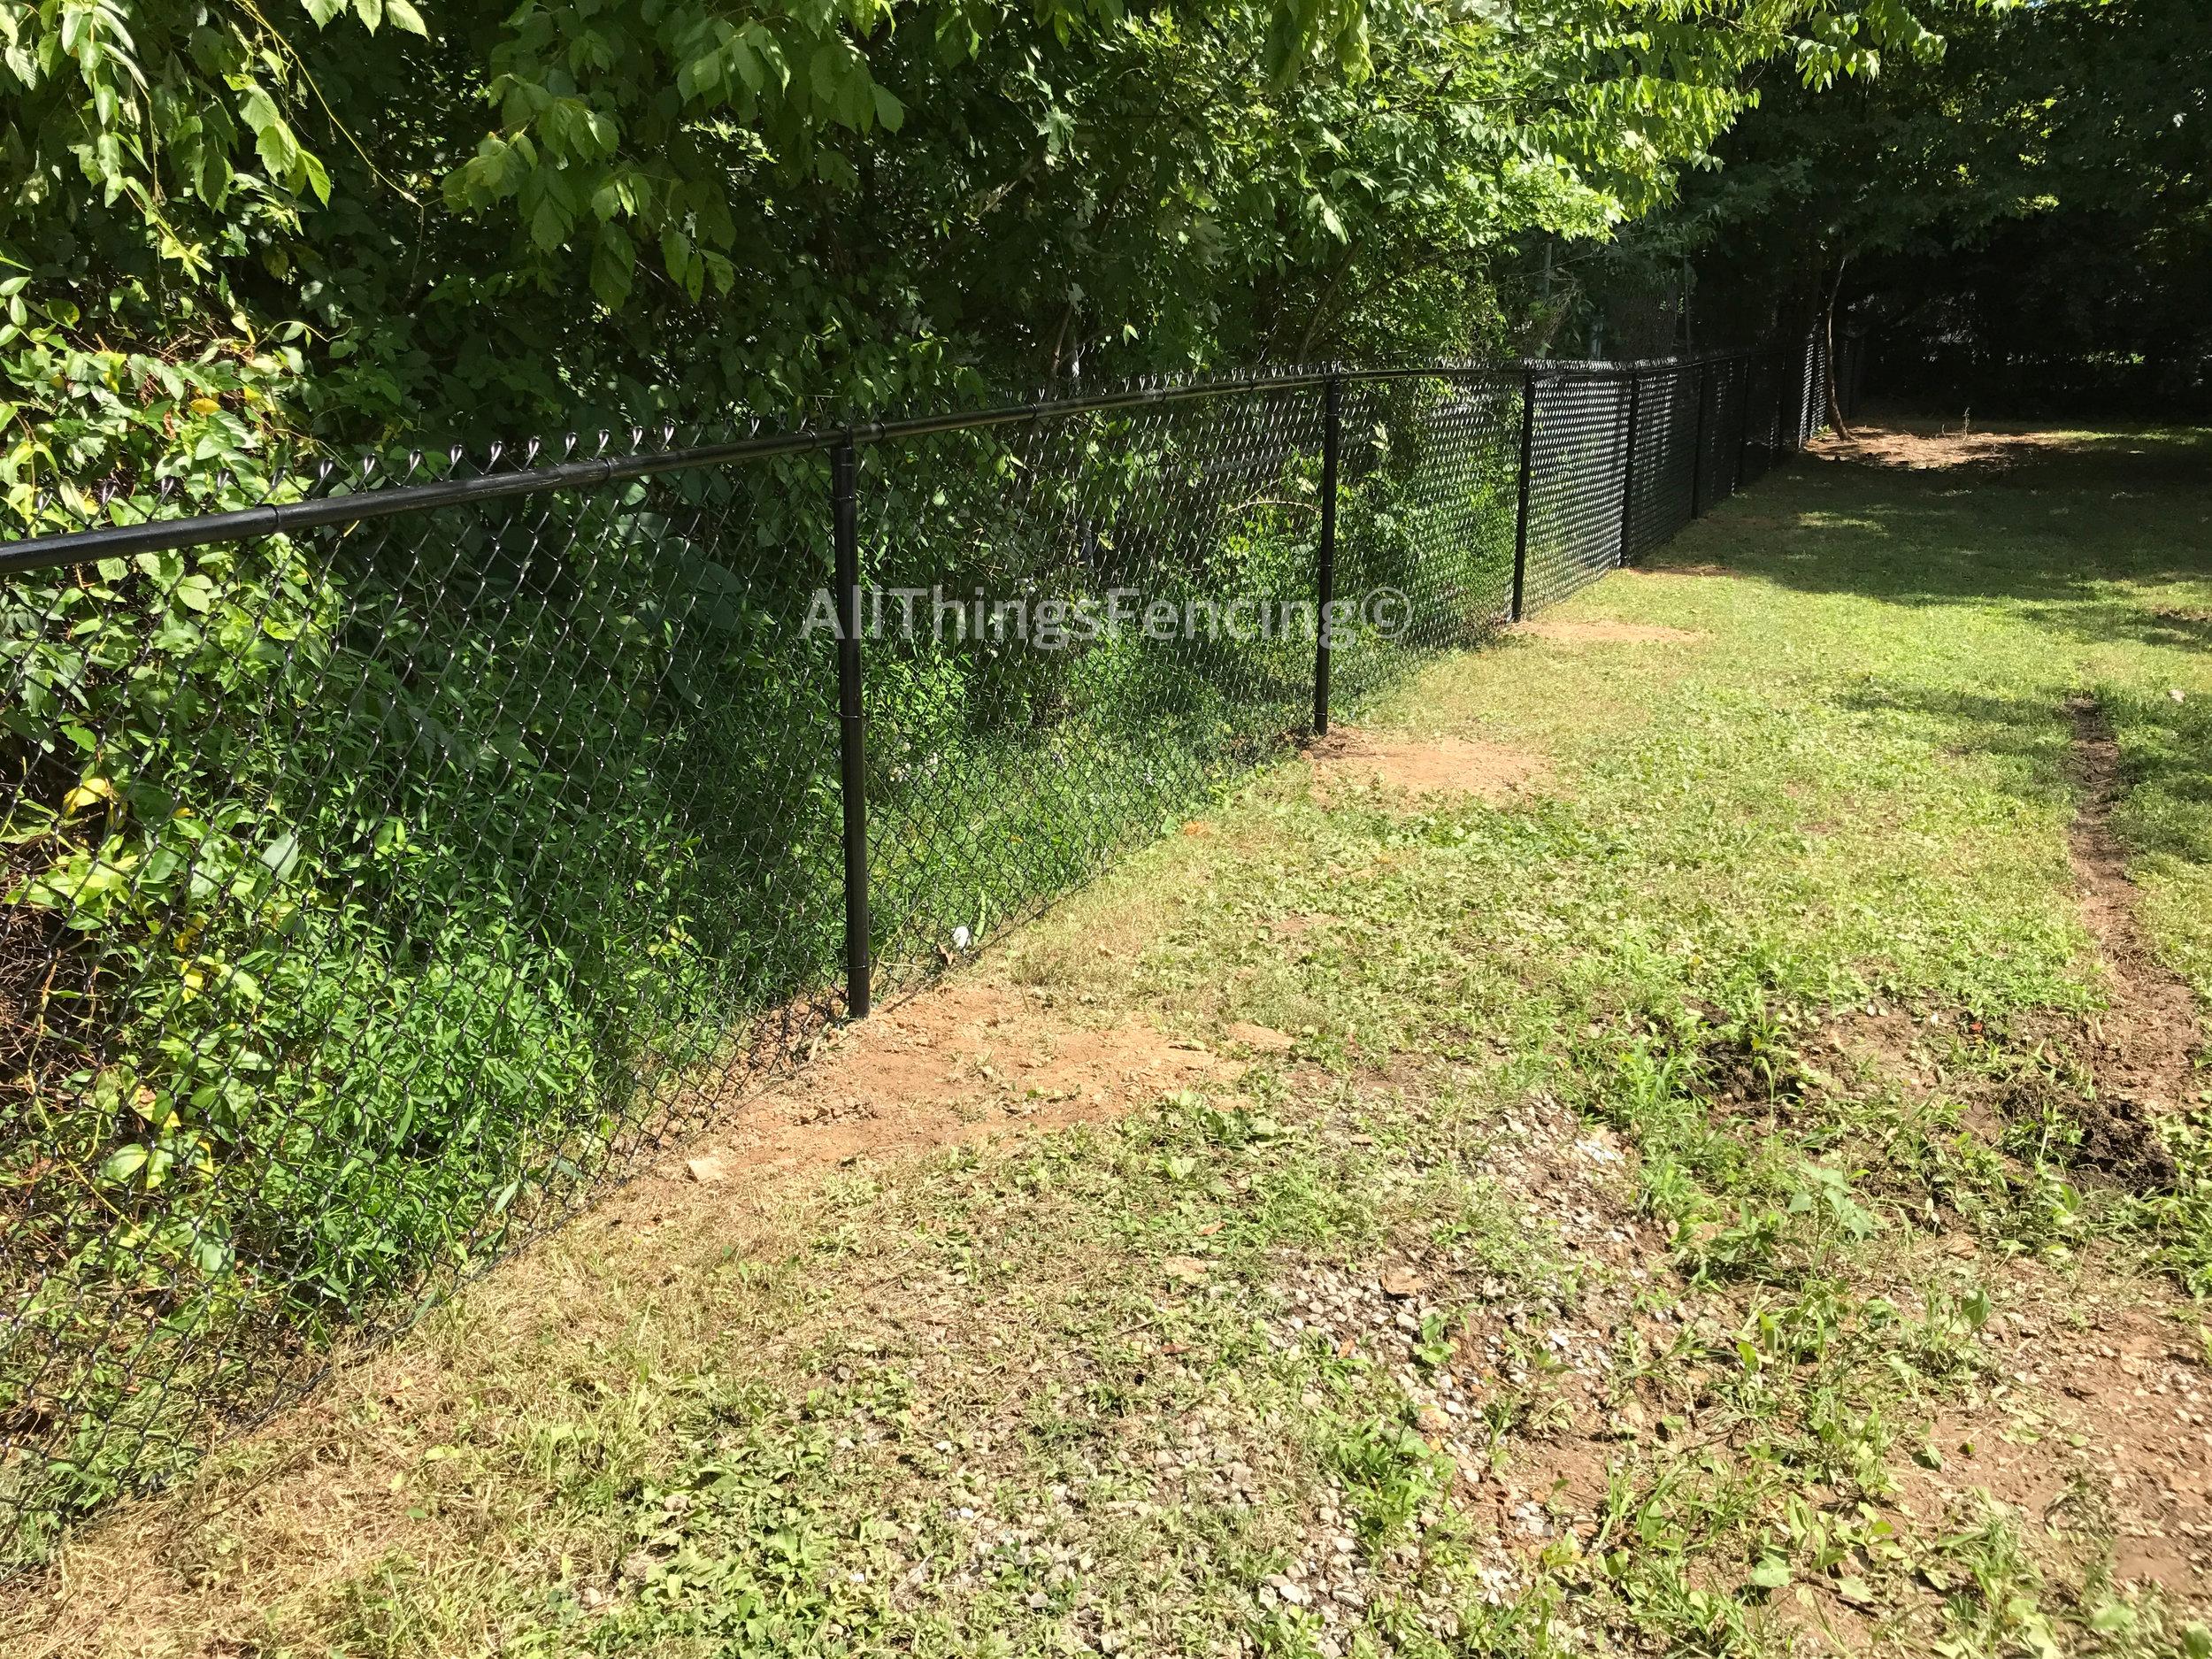 Fence9.jpg